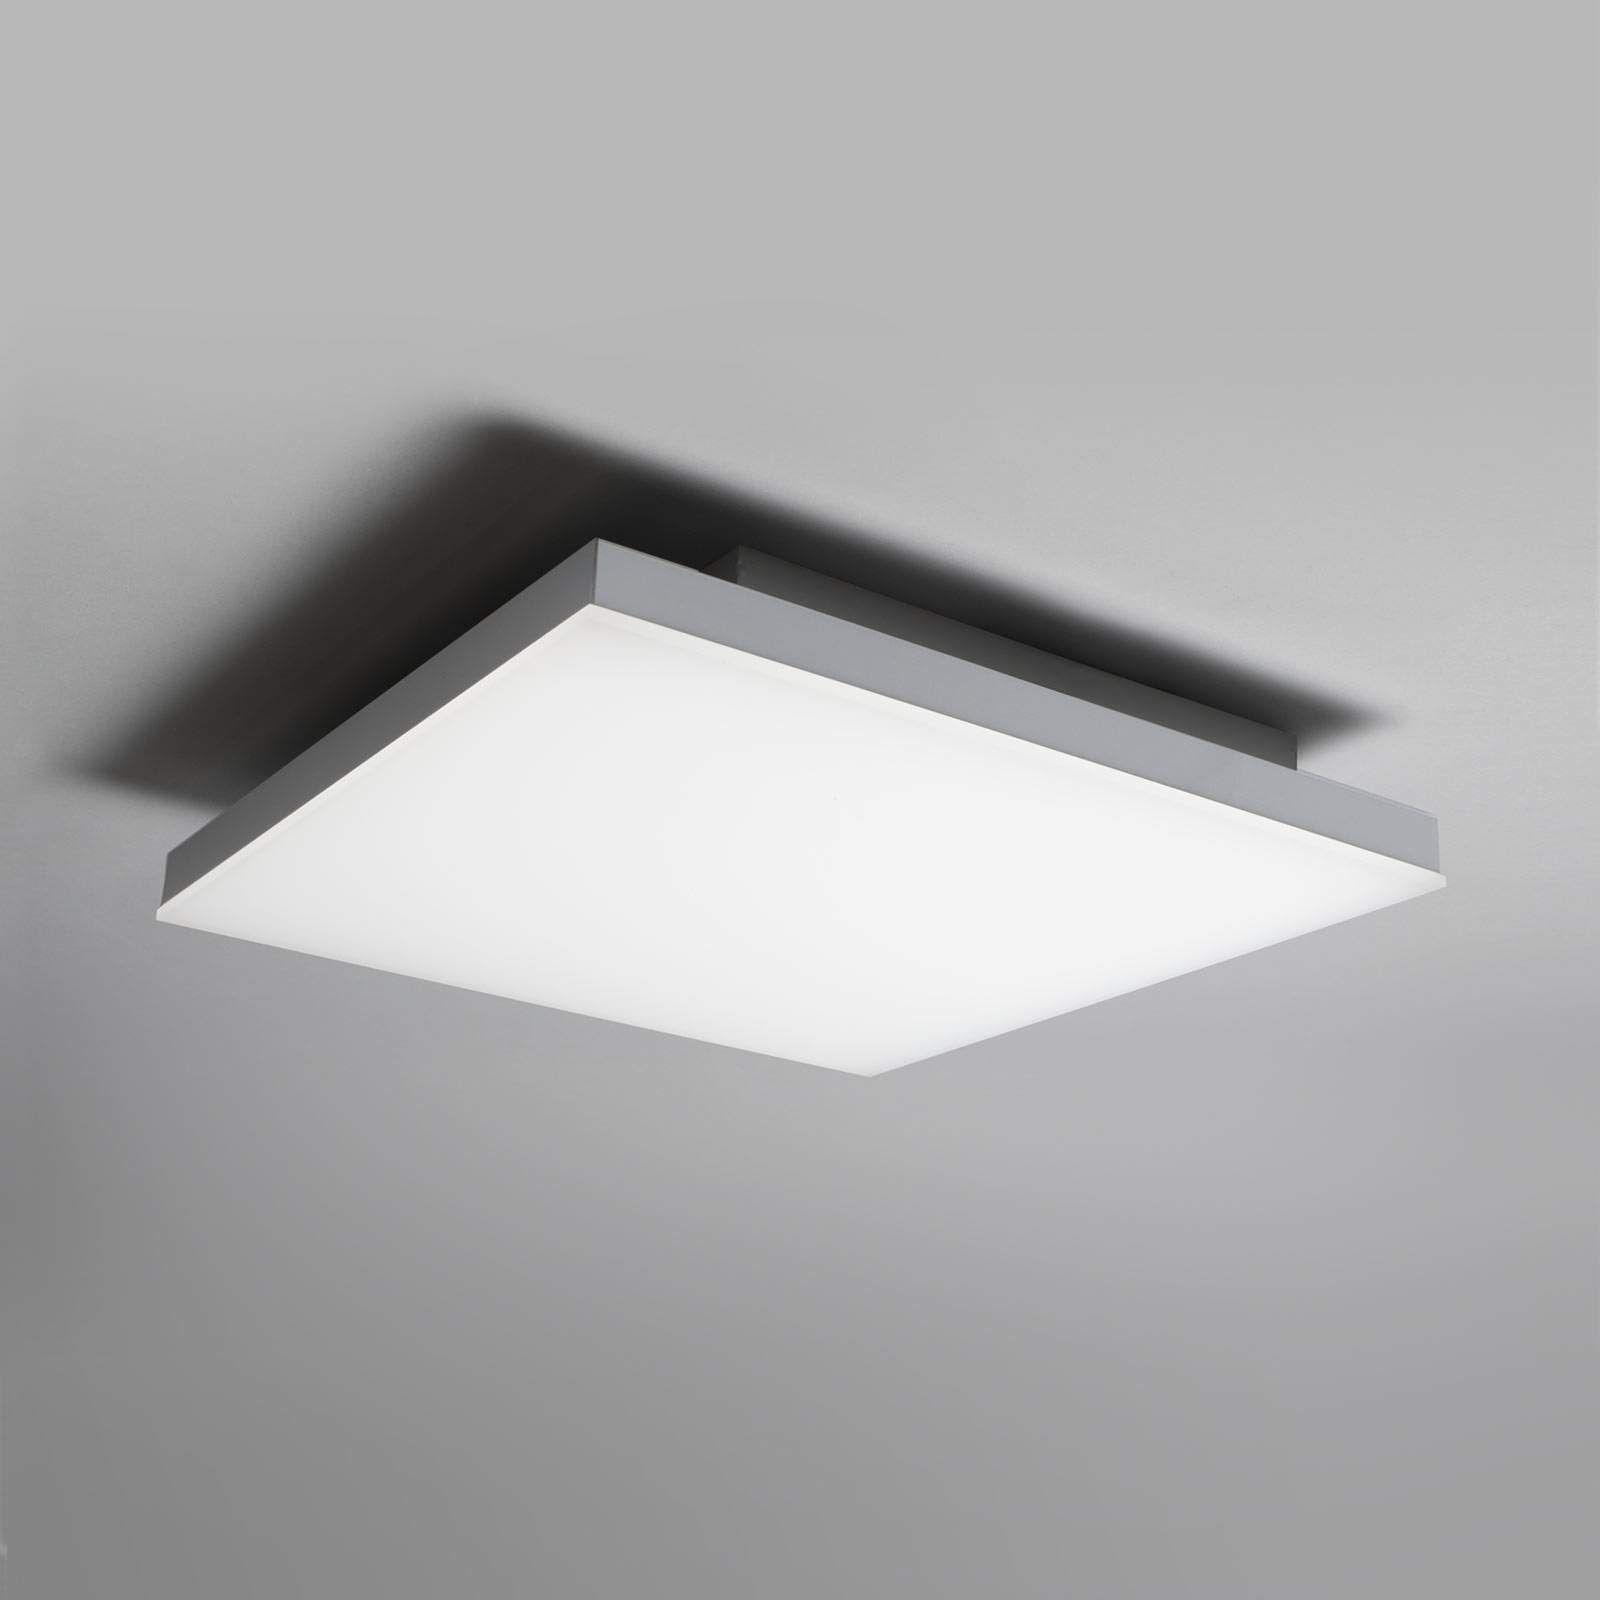 Full Size of Osram Led Panel Planon Plus Light 1200x300mm Surface Mount Kit (1200 X 300mm) 600x600 Table Lamp 32w 600 1200x300 60x60 300x600mm Paneli Lightify Ledvance 40w Wohnzimmer Osram Led Panel